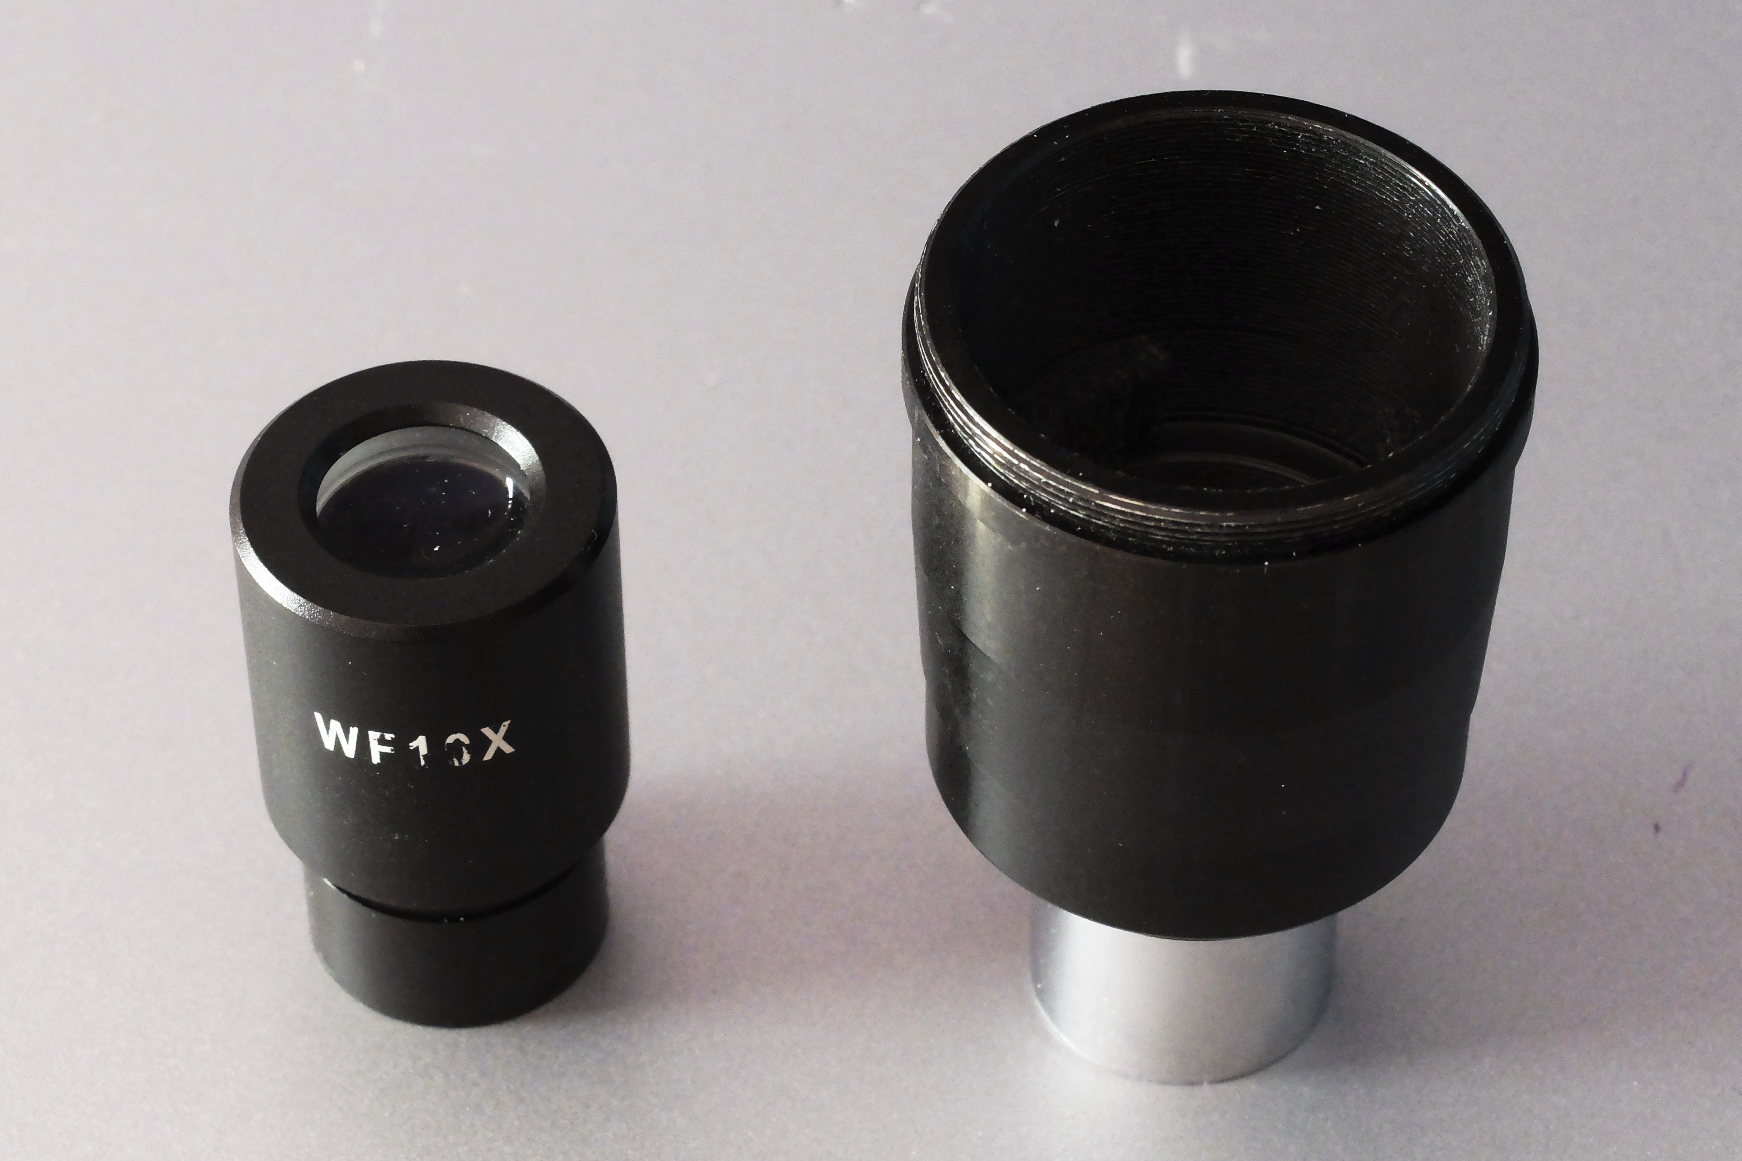 Mikroskop kamera fotos videos anleitung youtube